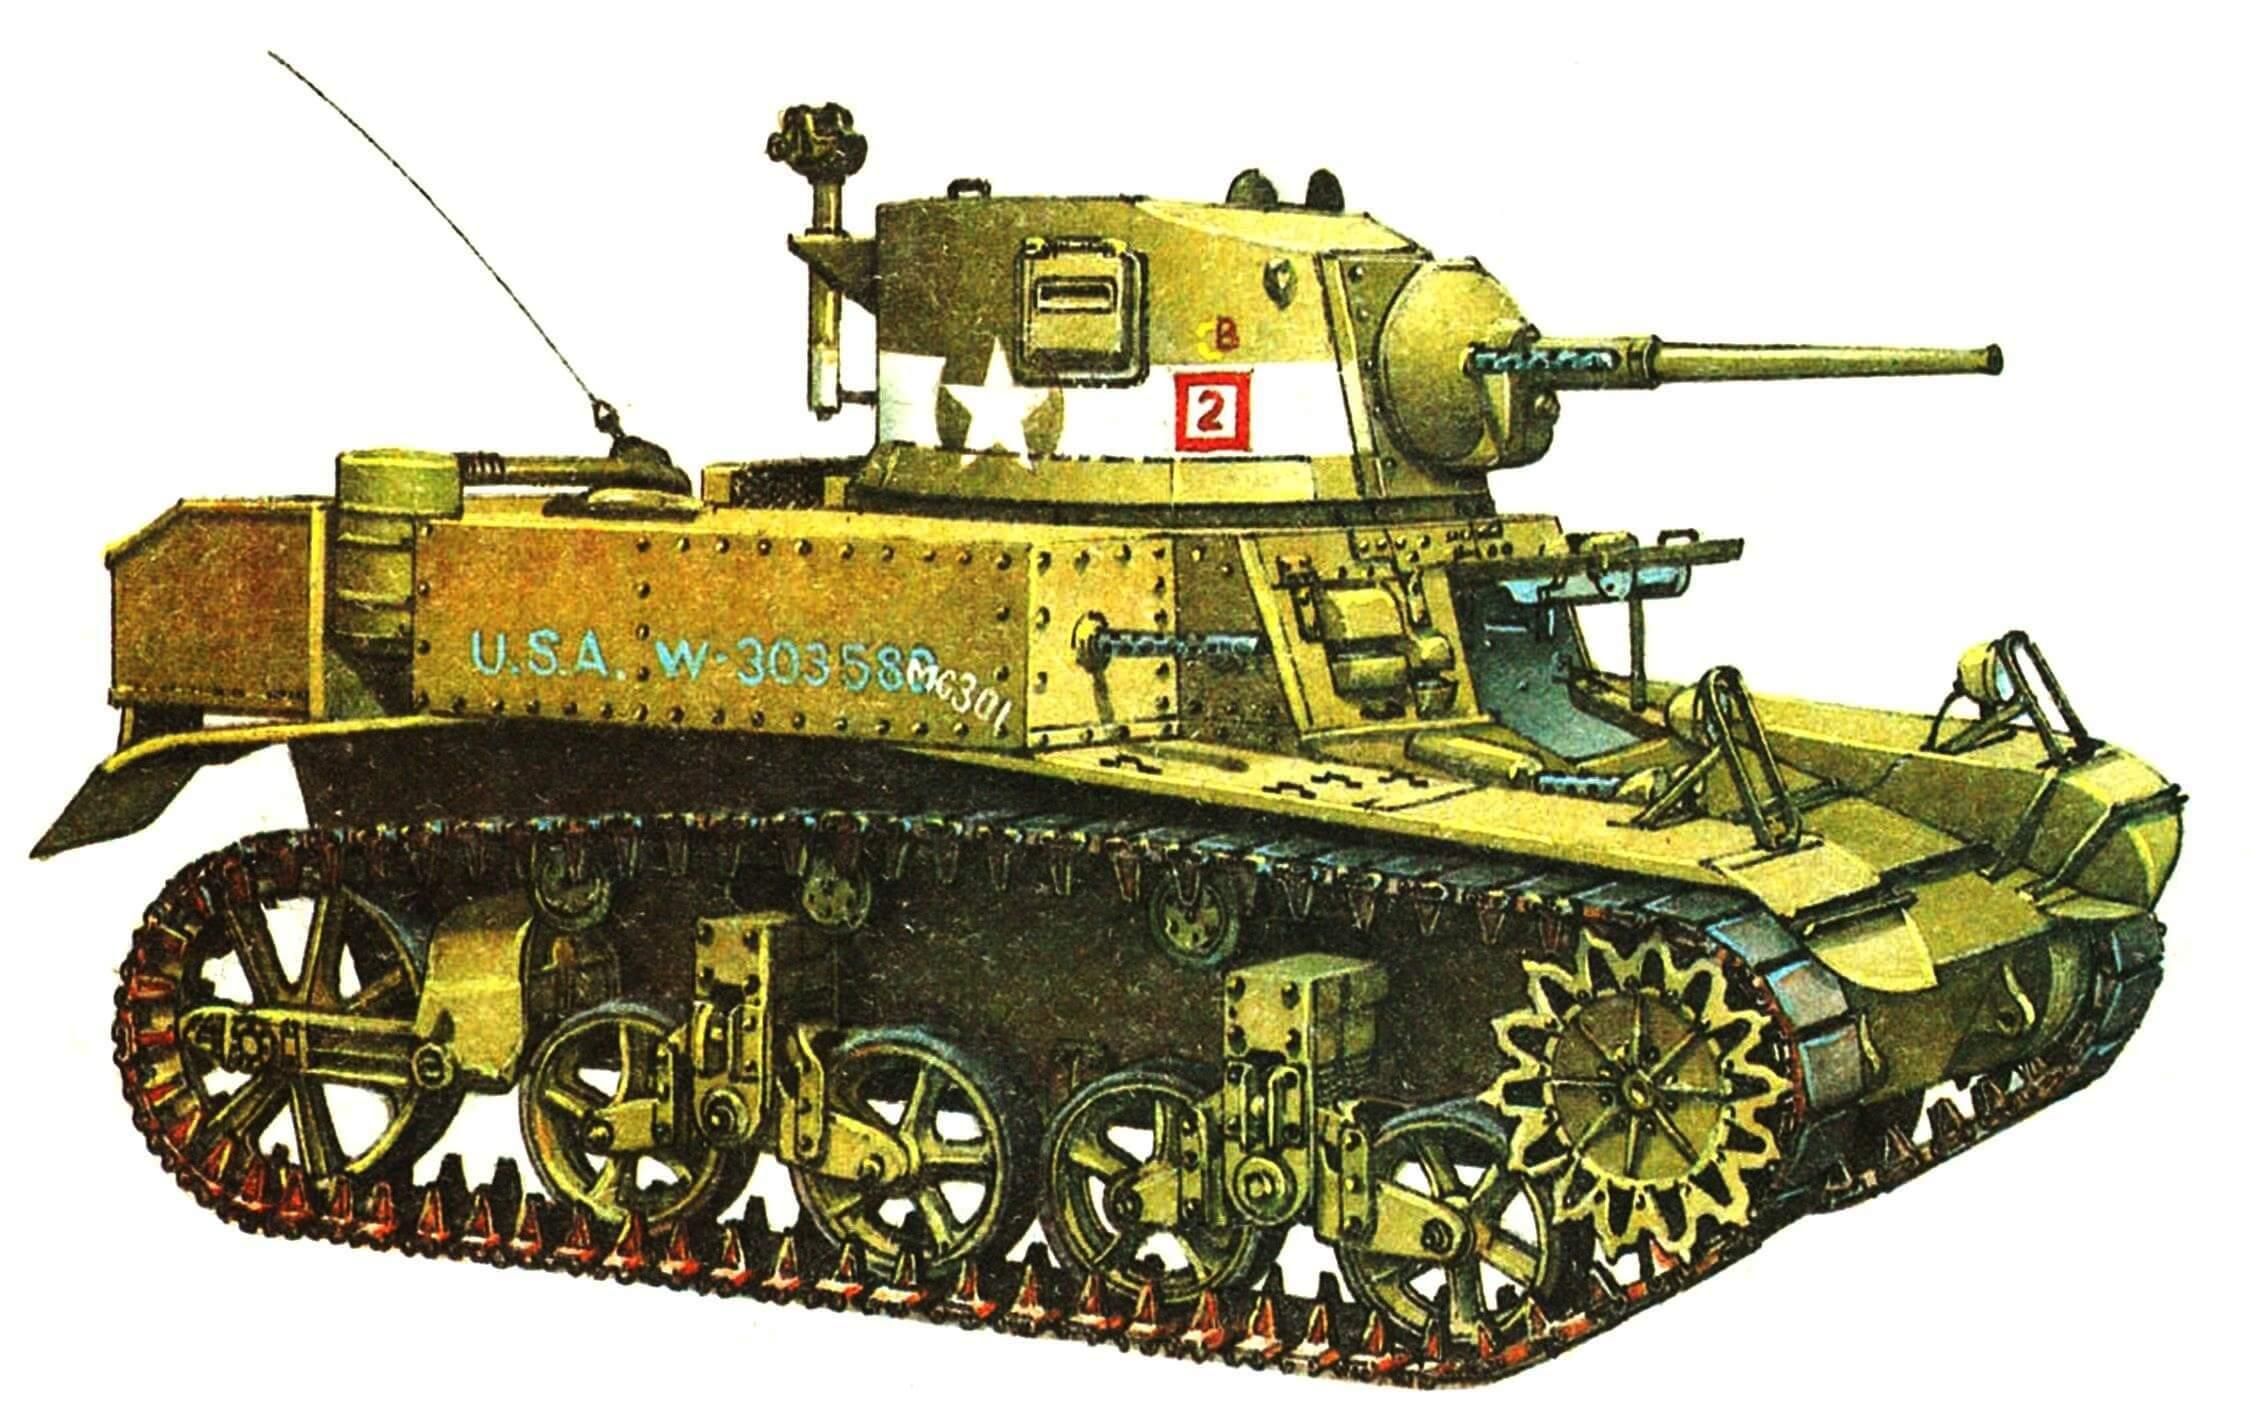 Легкий танк М3А1 (Diesel). Рота «С», 1-й танковый батальон морской пехоты. Гвадалканал, декабрь 1942 года.